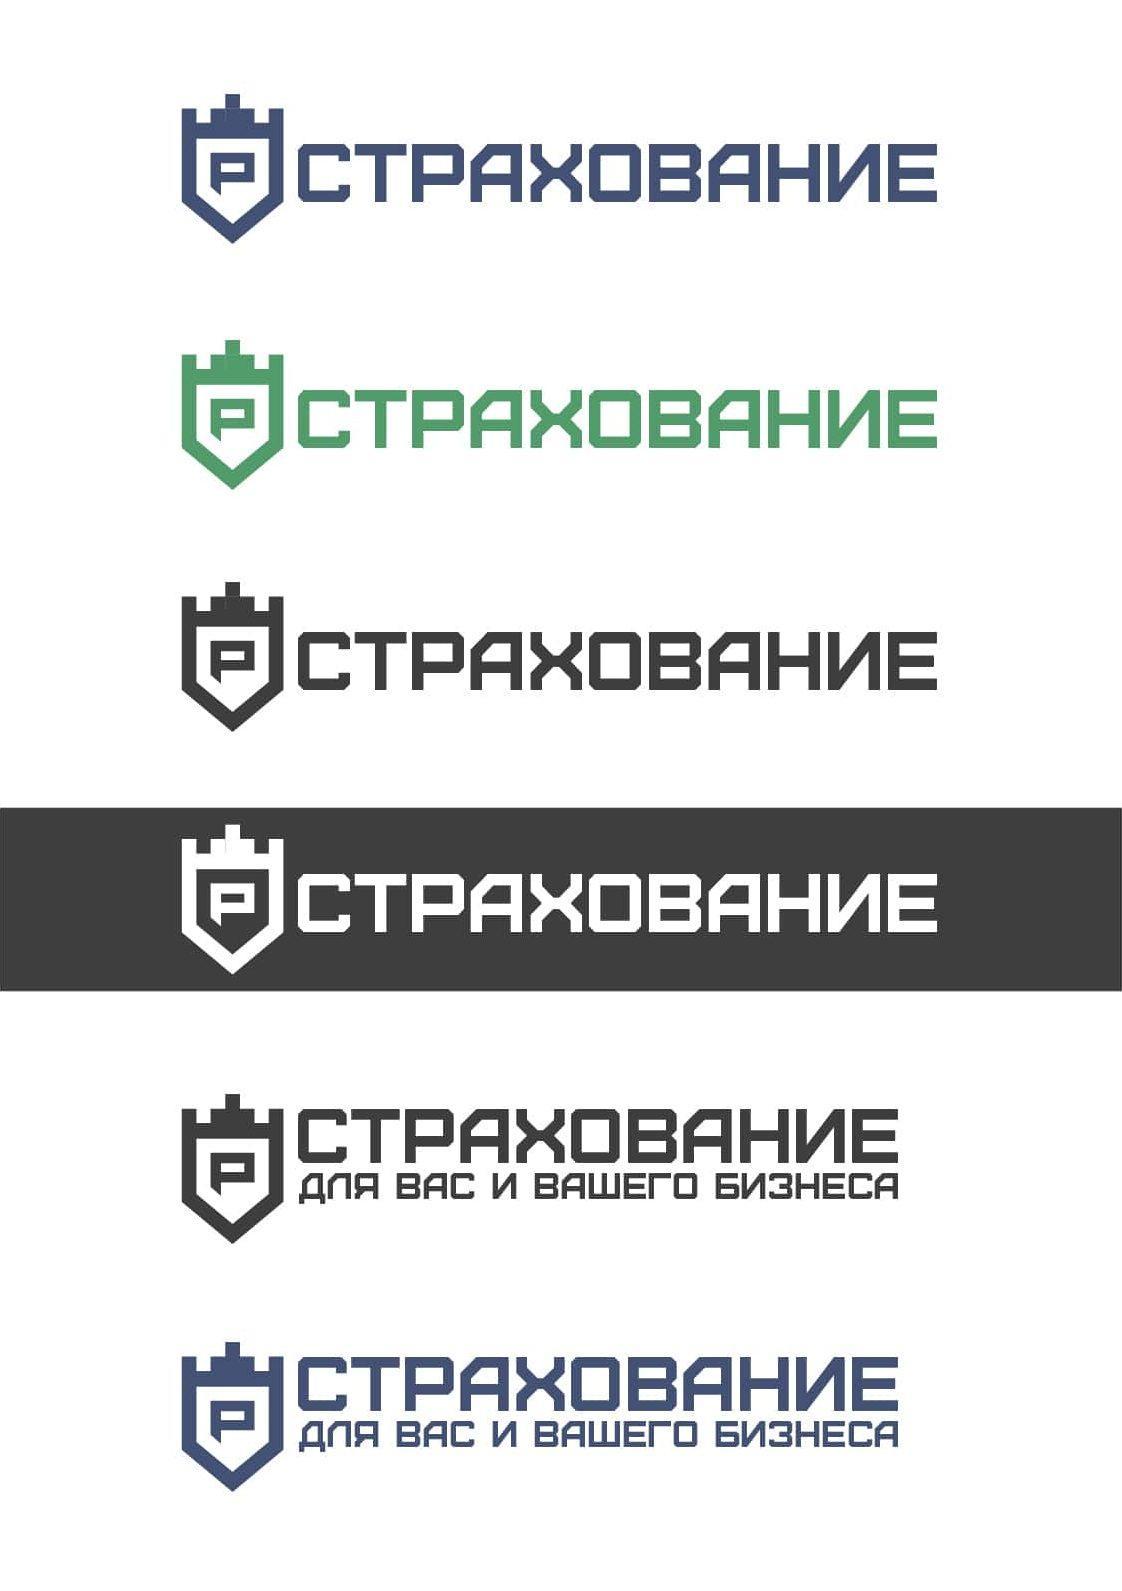 логотип в виде крепости и щита